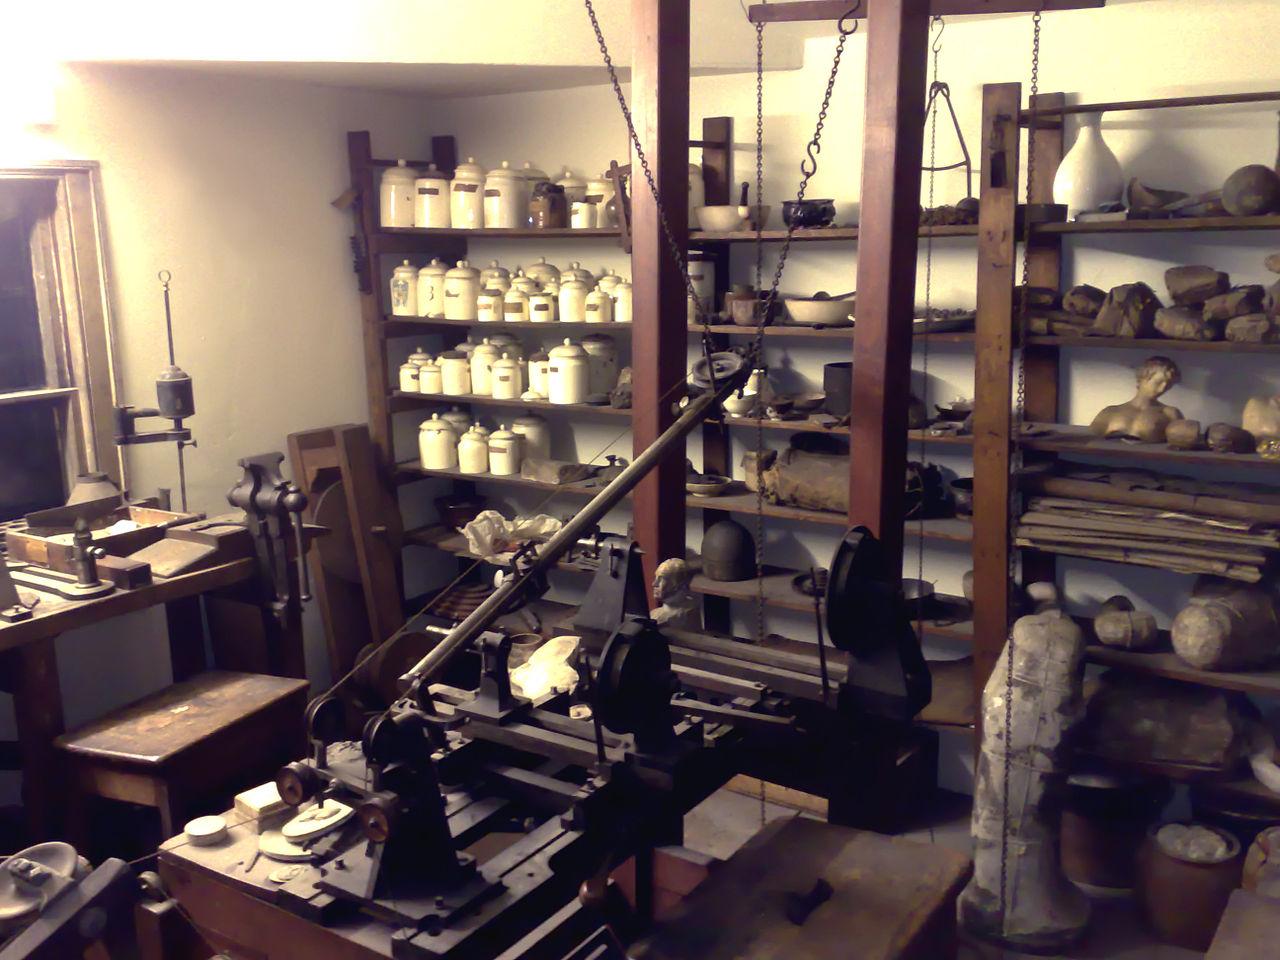 Watts Werkstatt (Science Museum, London)